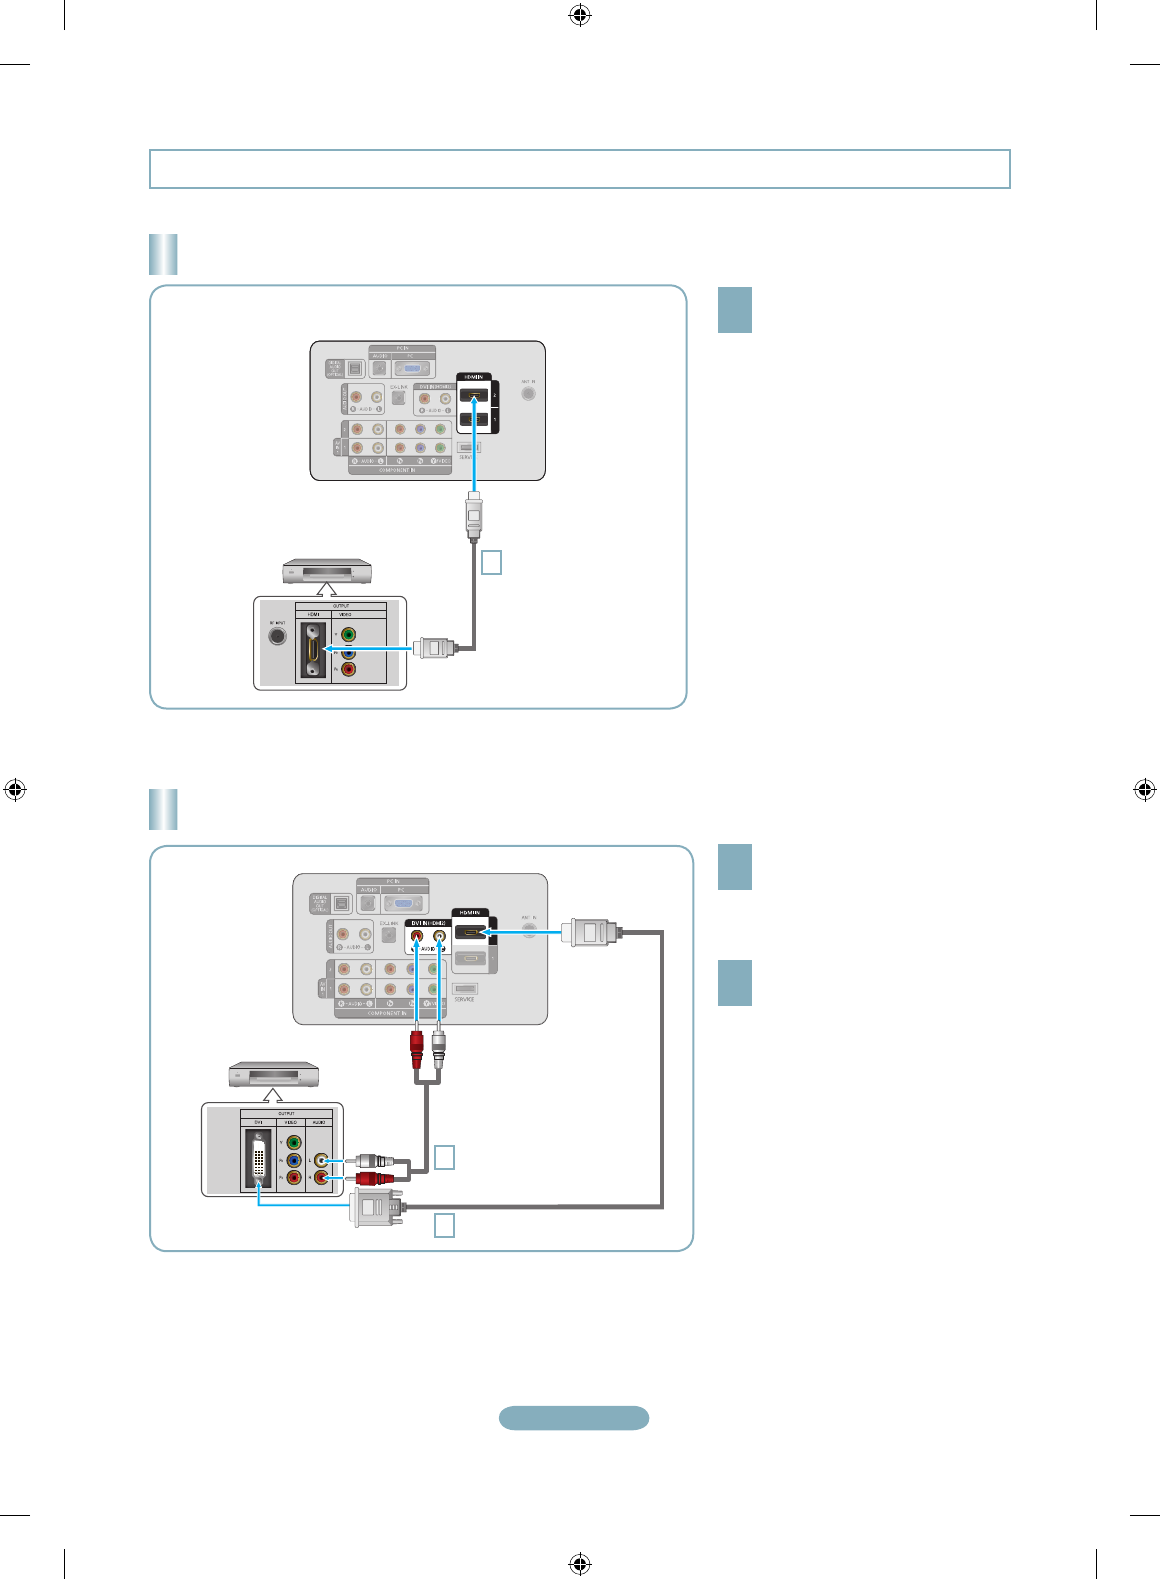 Samsung LN26A330J1D, LN32A330J1D, LN37A330J1D, LN40A330J1D ...